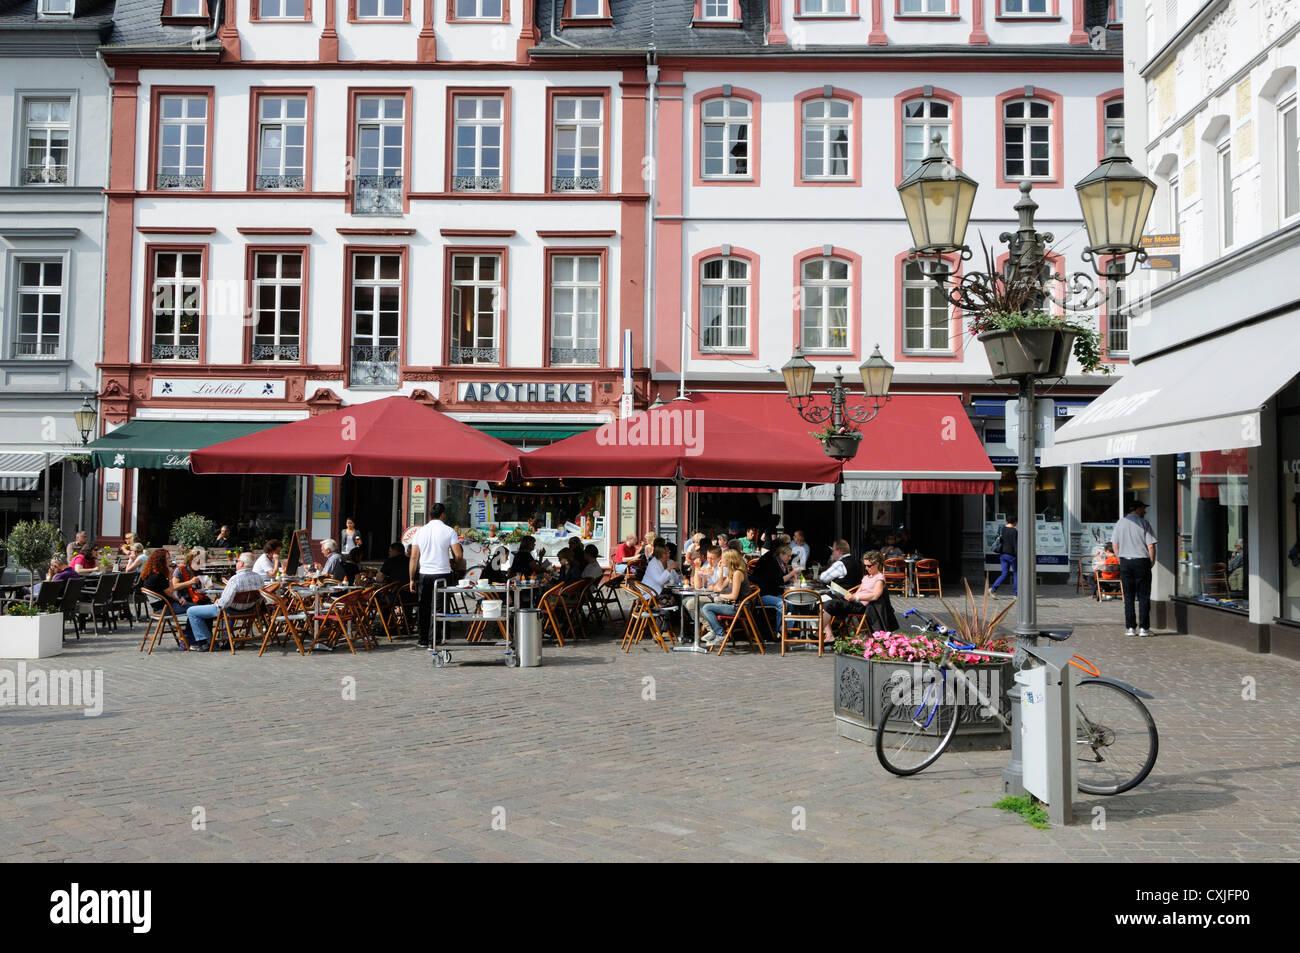 gelateria brustolon jesuitenplatz koblenz germany stock photo royalty free image 50809304. Black Bedroom Furniture Sets. Home Design Ideas